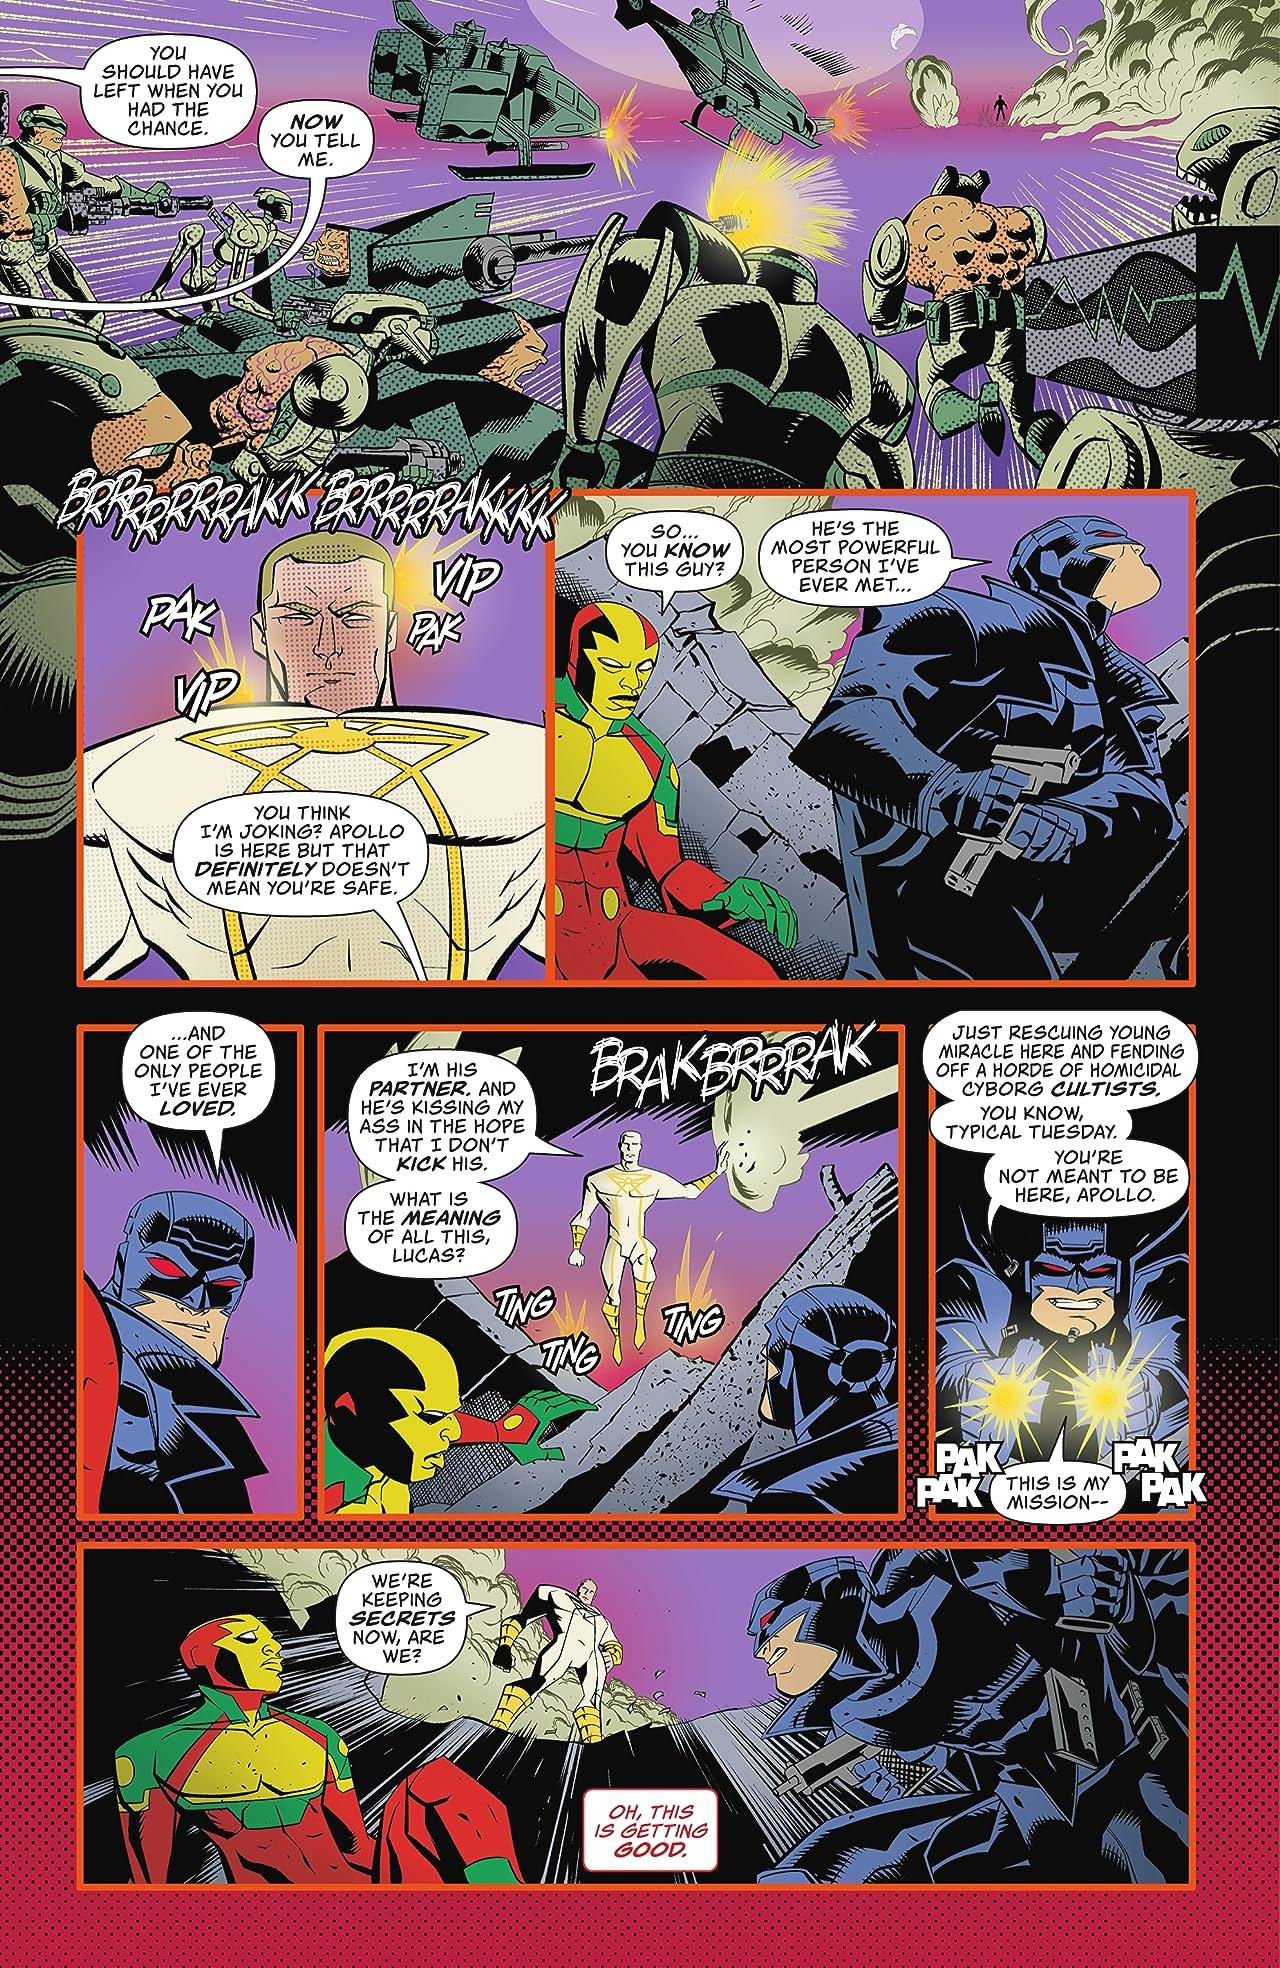 Midnighter 2021 Annual (2021) #1